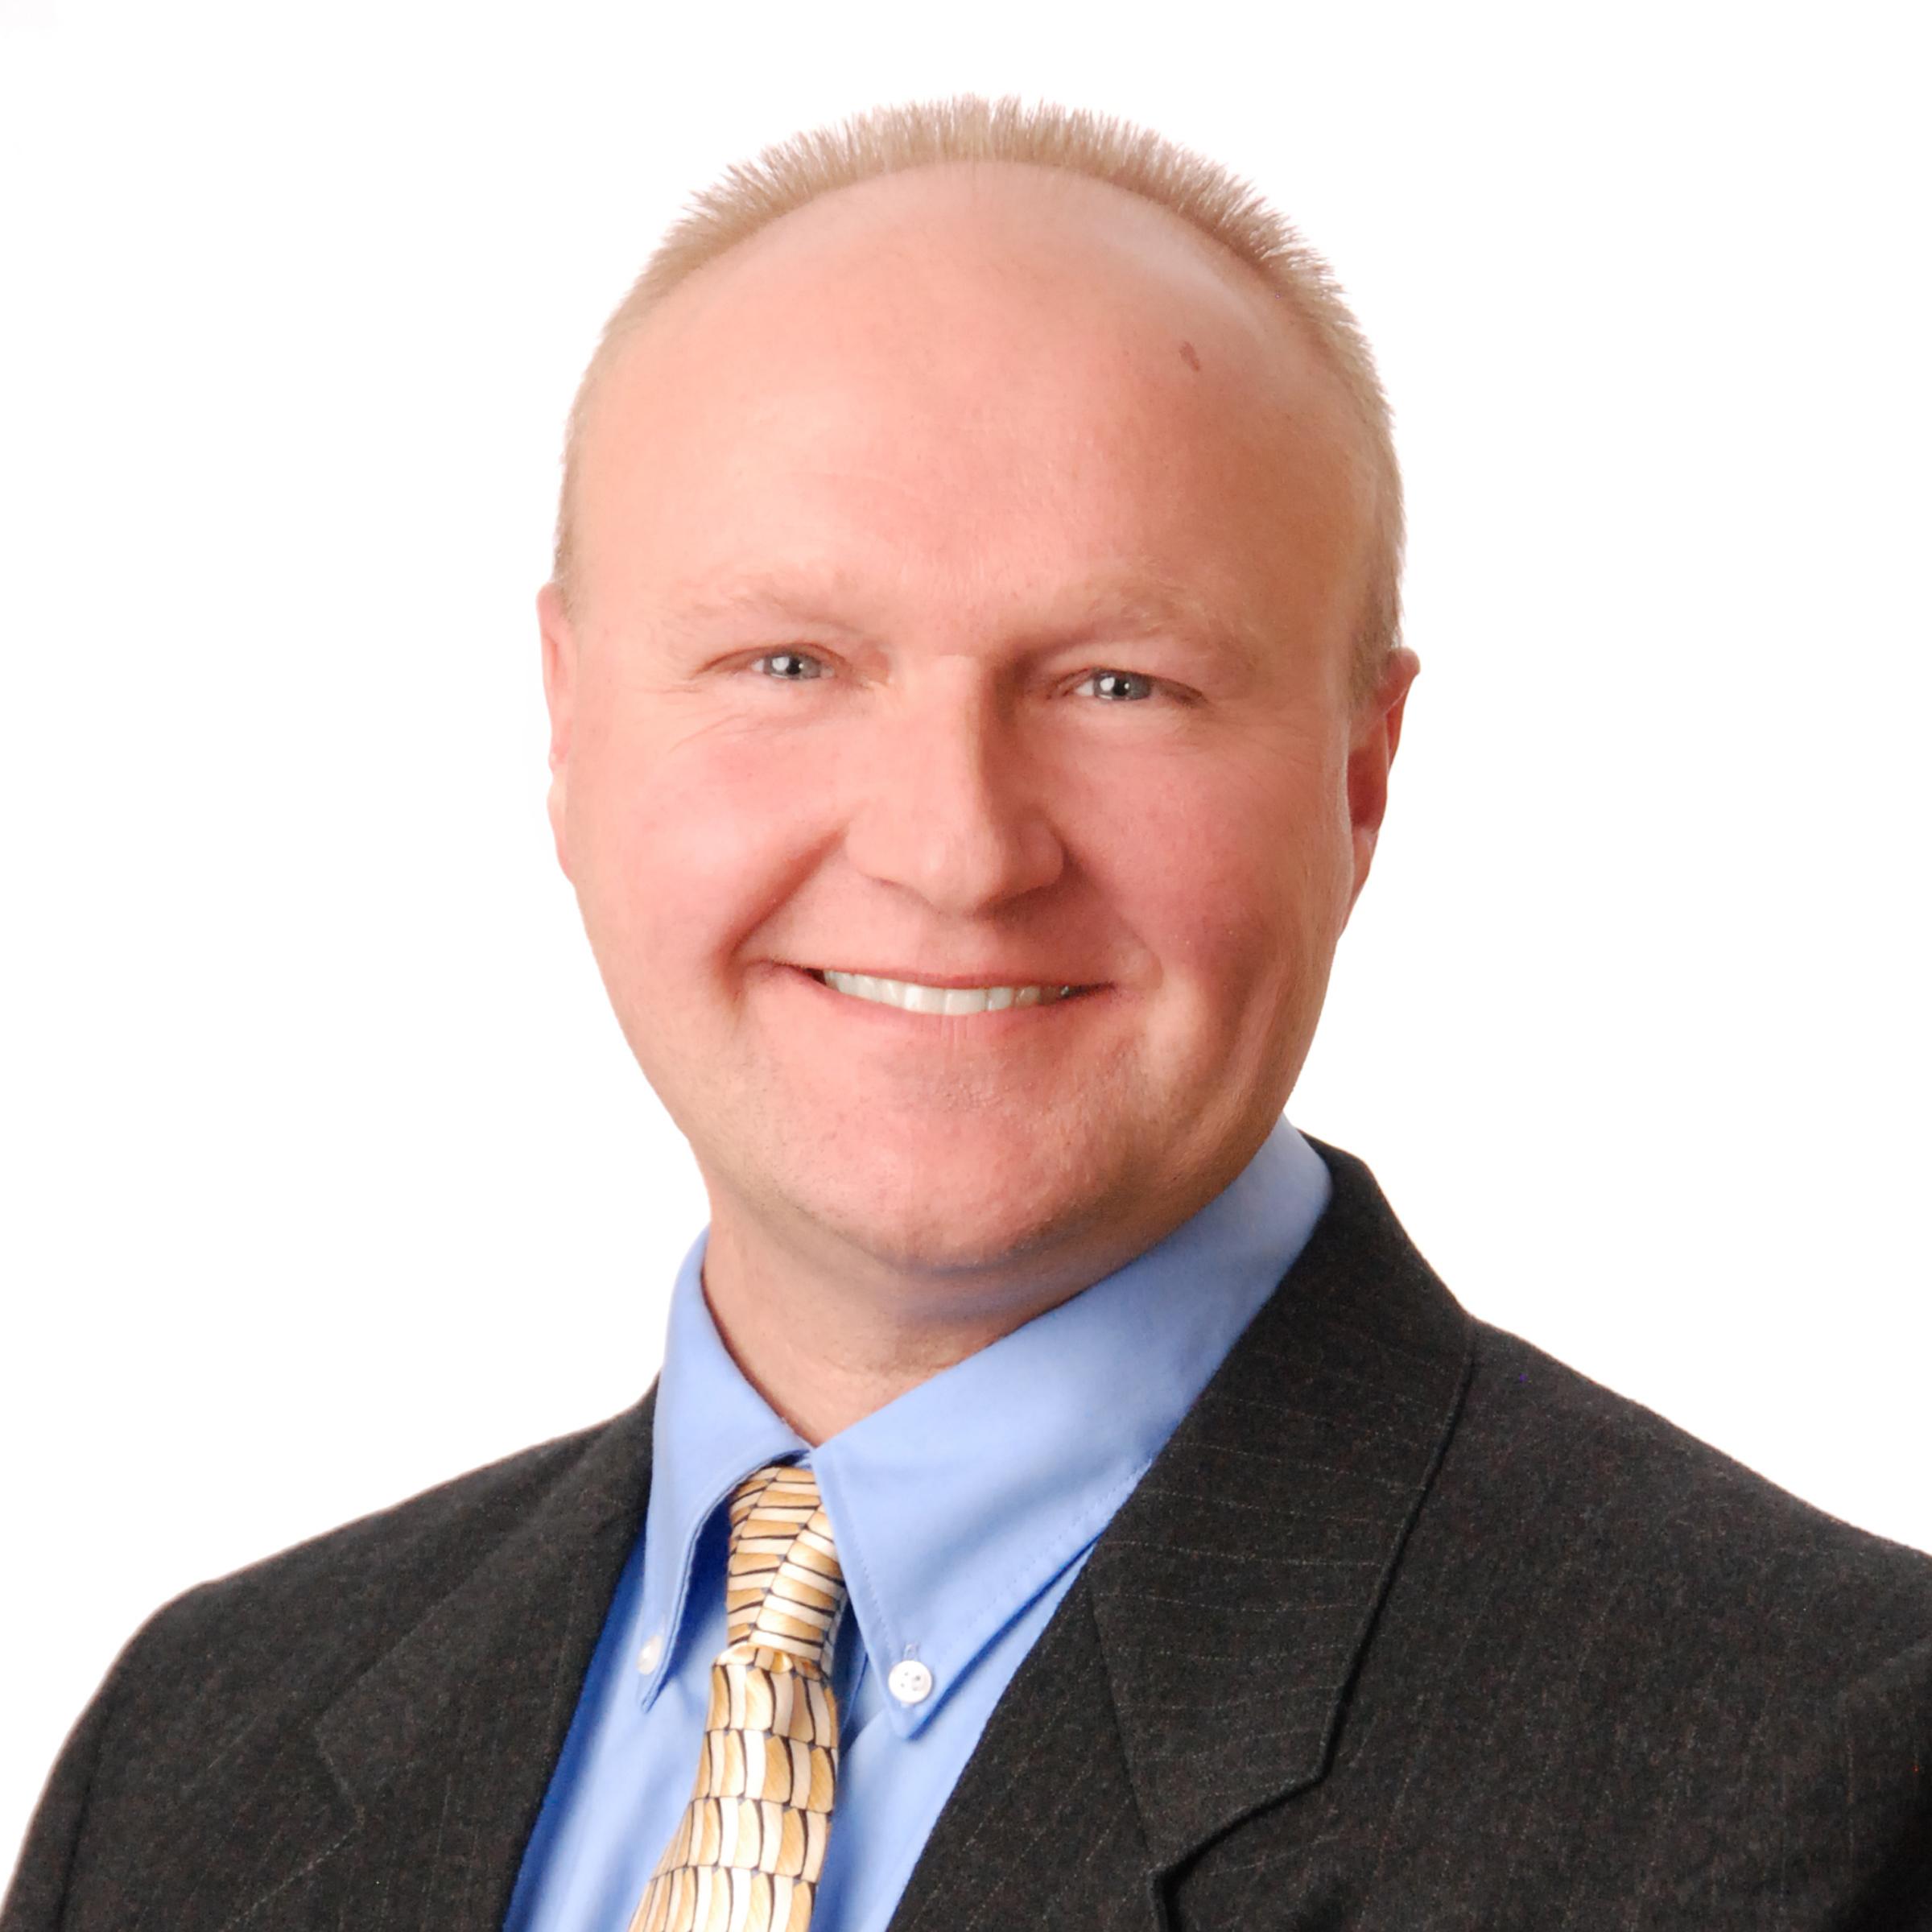 Northeast Financial Planning - Randy Dean